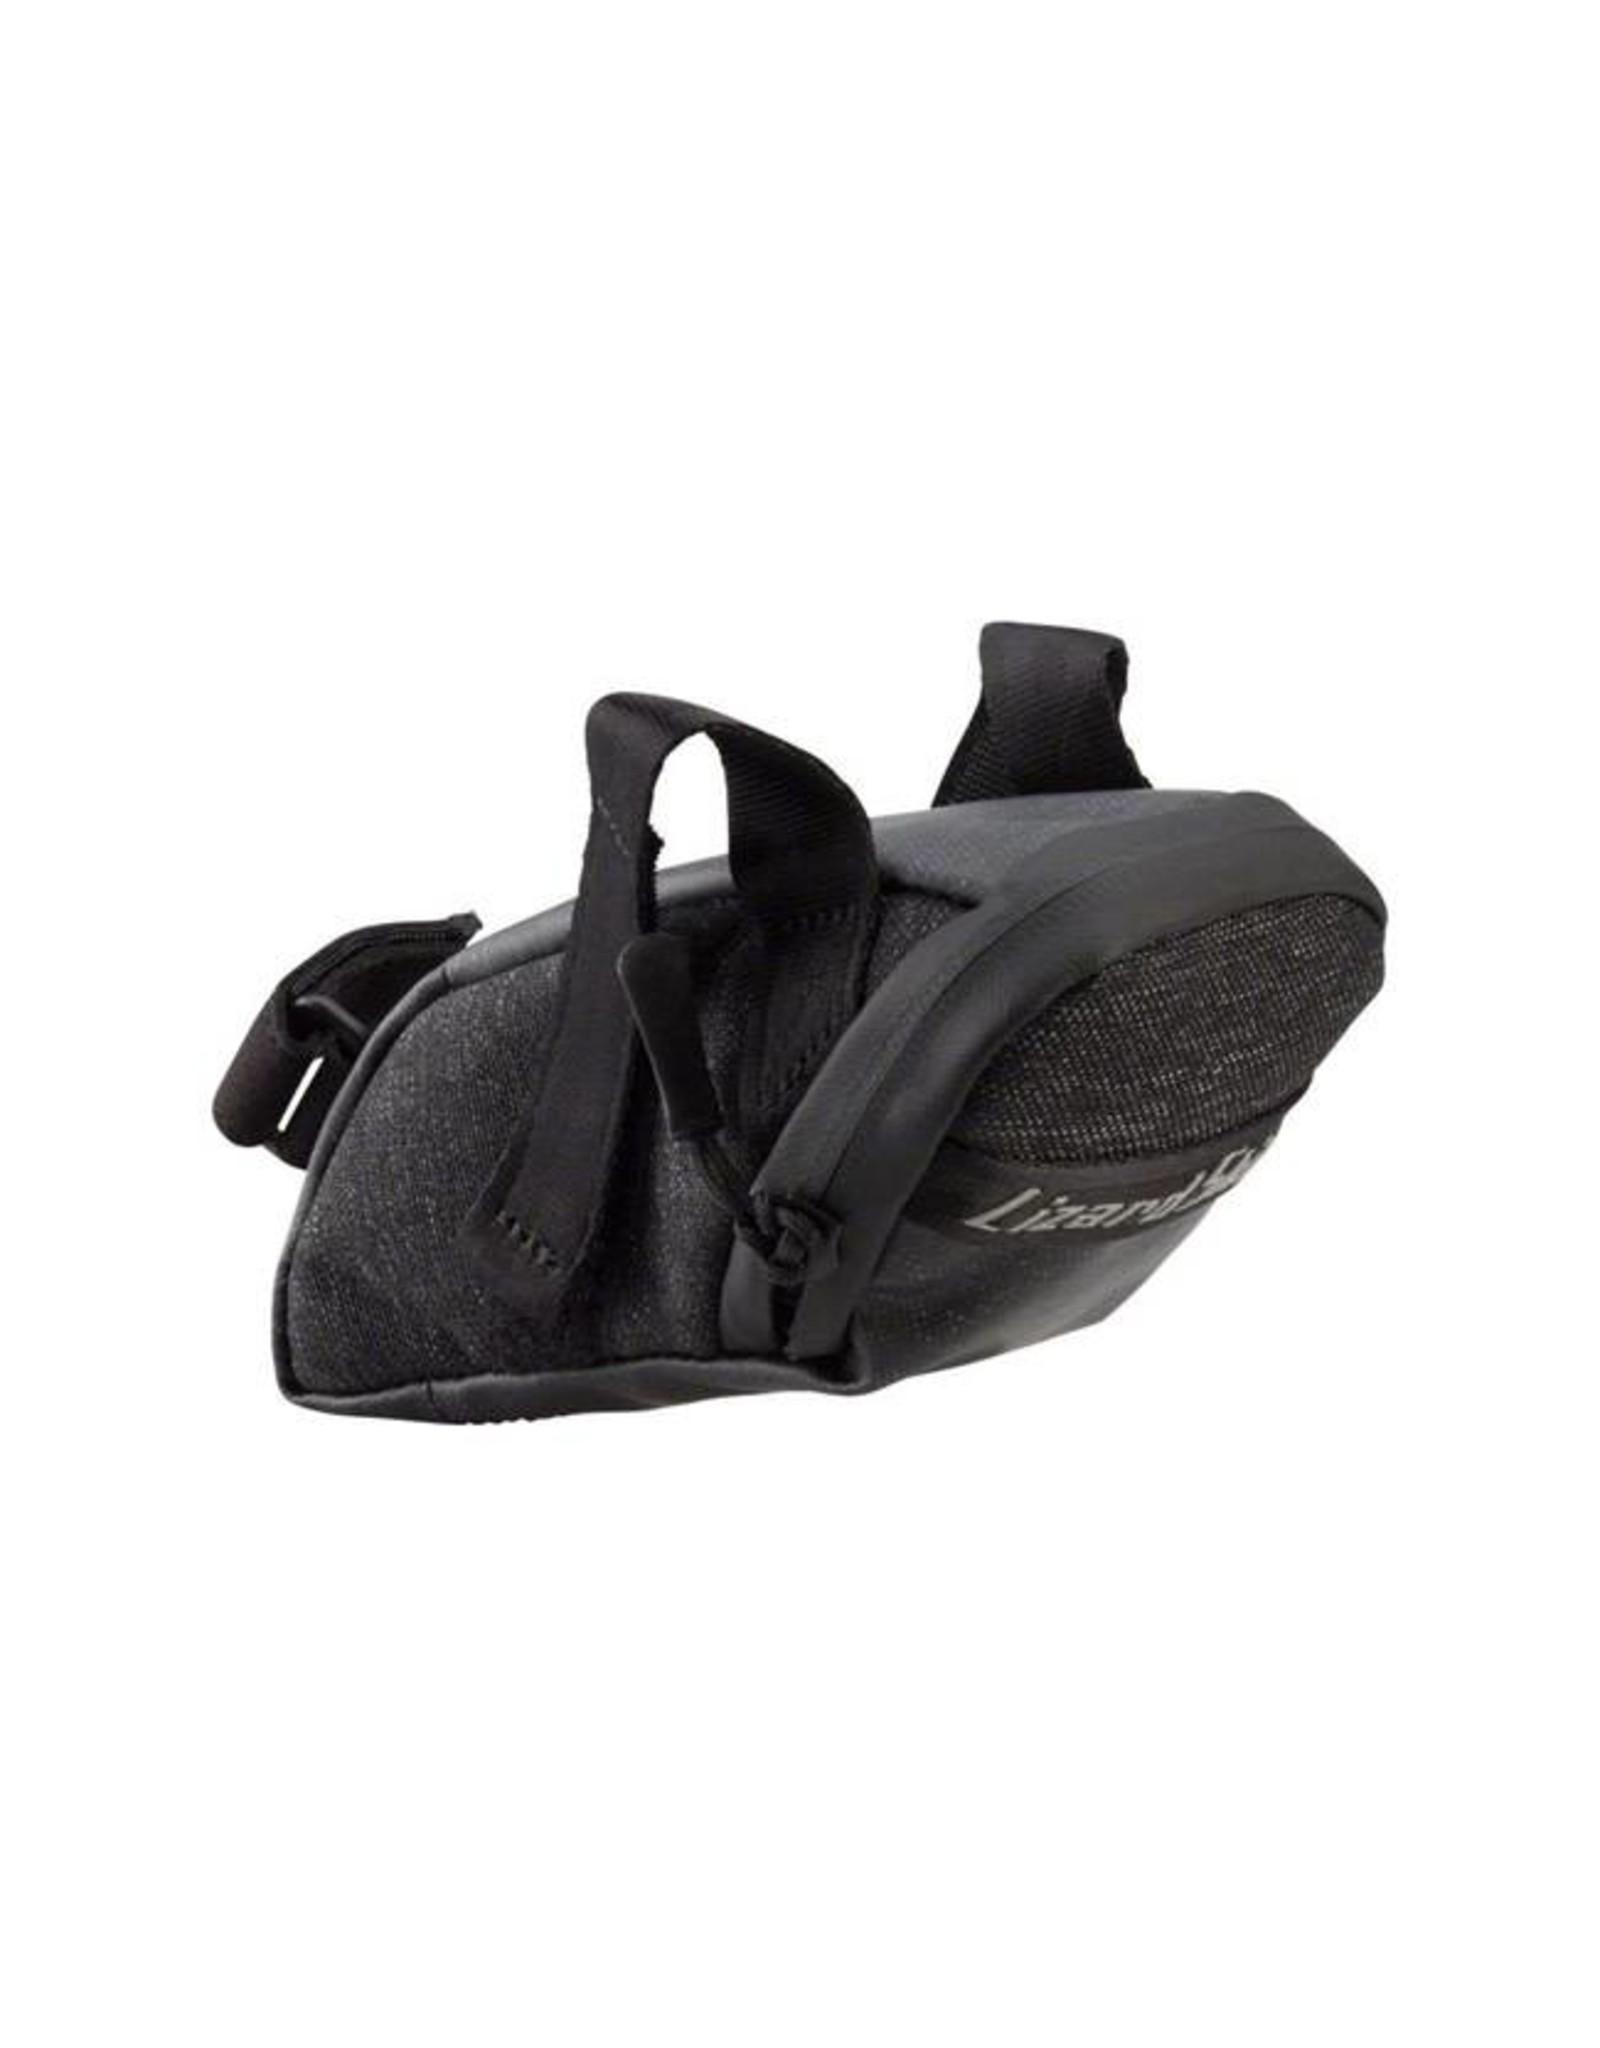 Lizard Skins Lizard Skins Micro Cache Seat Bag: Jet Black